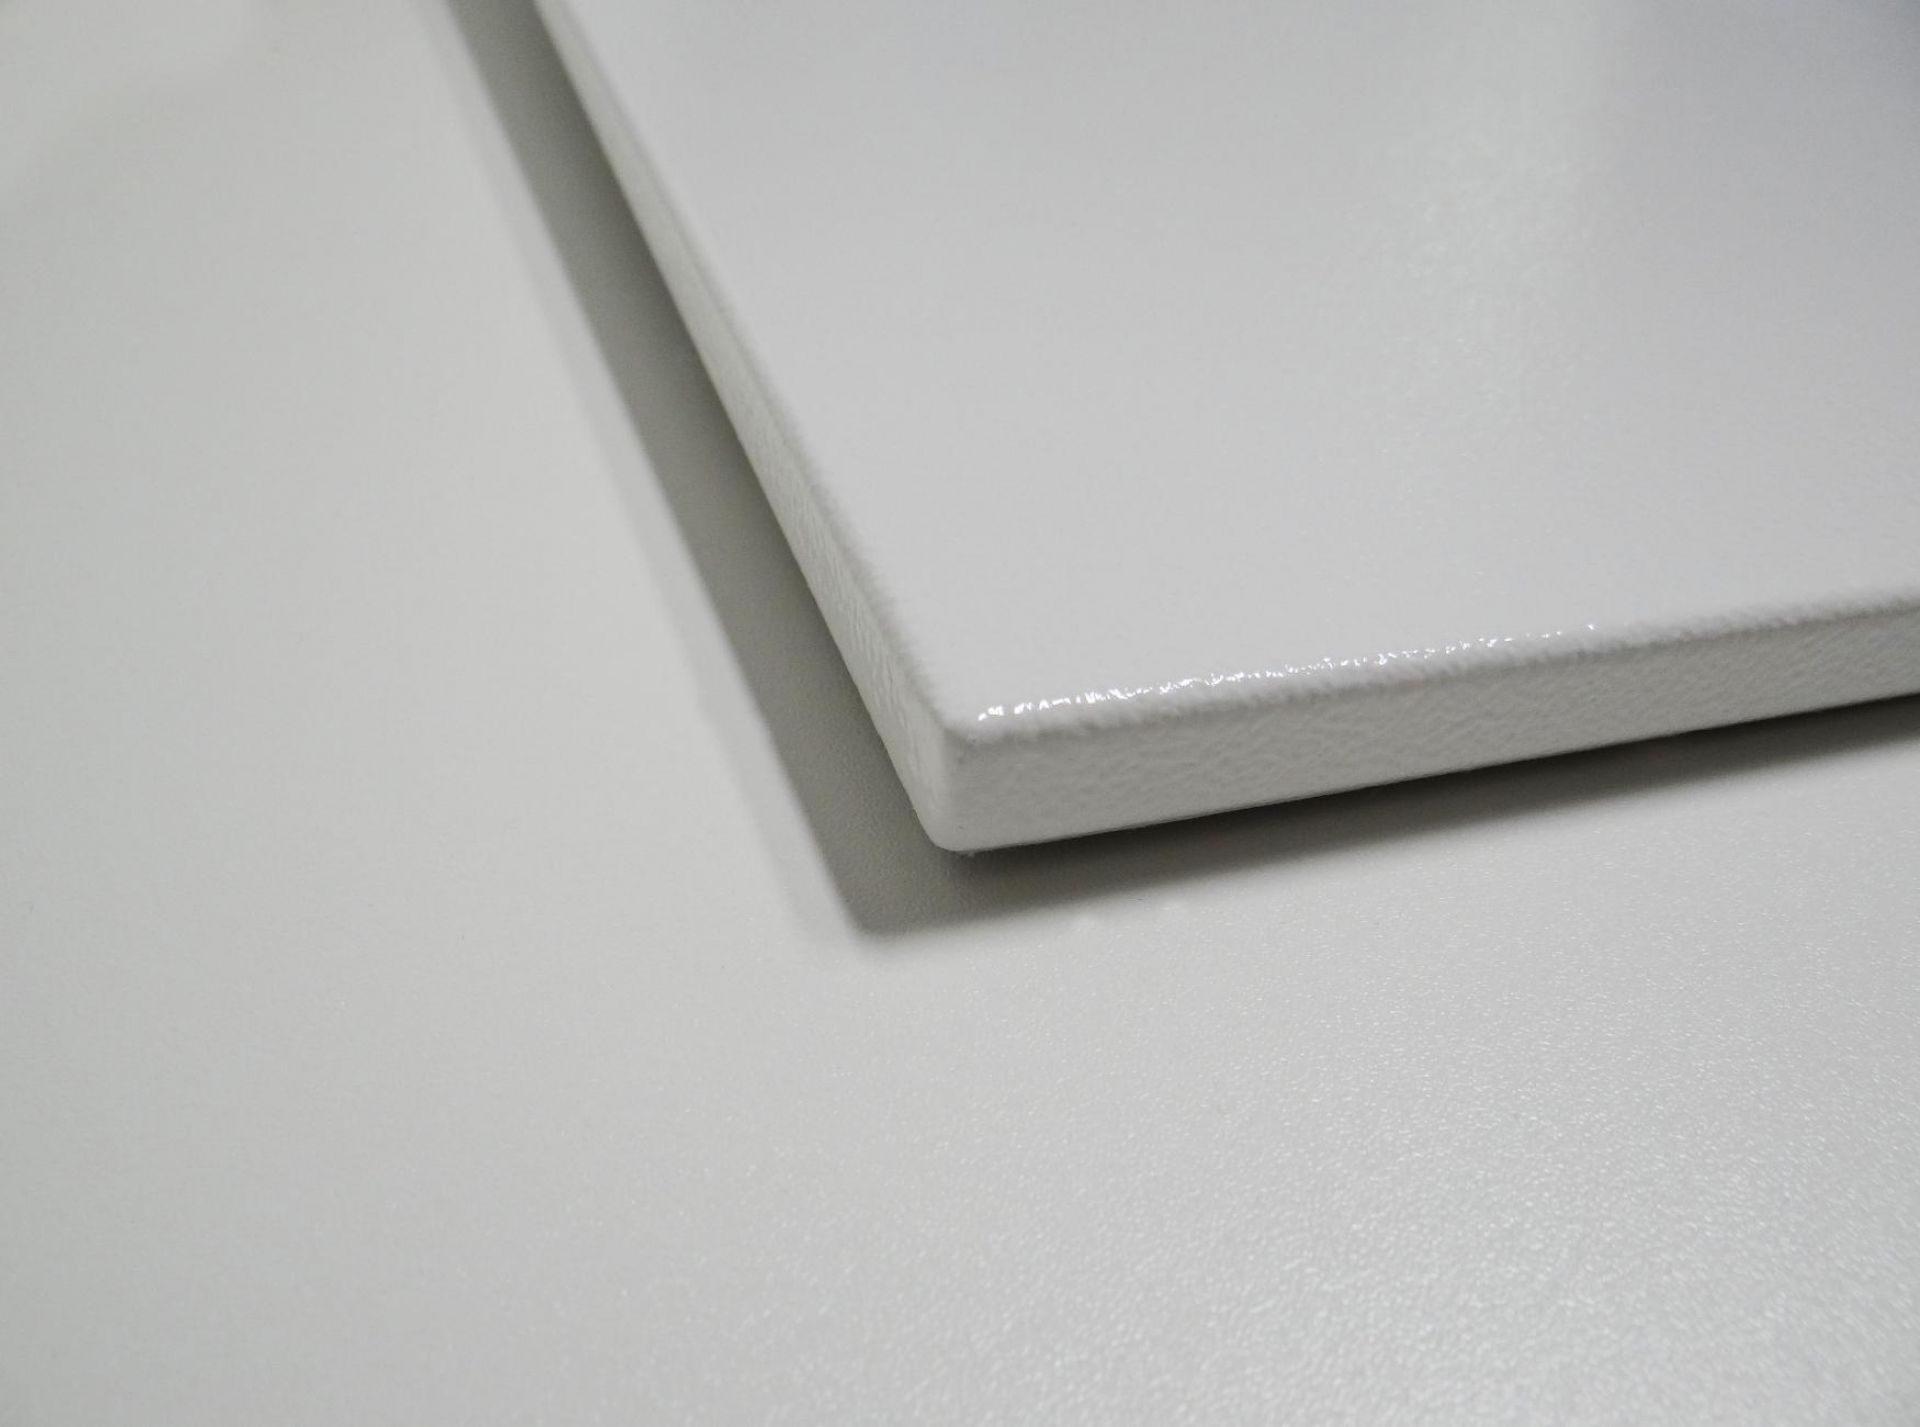 Infrarotheizung Powersun Reflex, Oberfläche, Knebel Infrarotheizungen